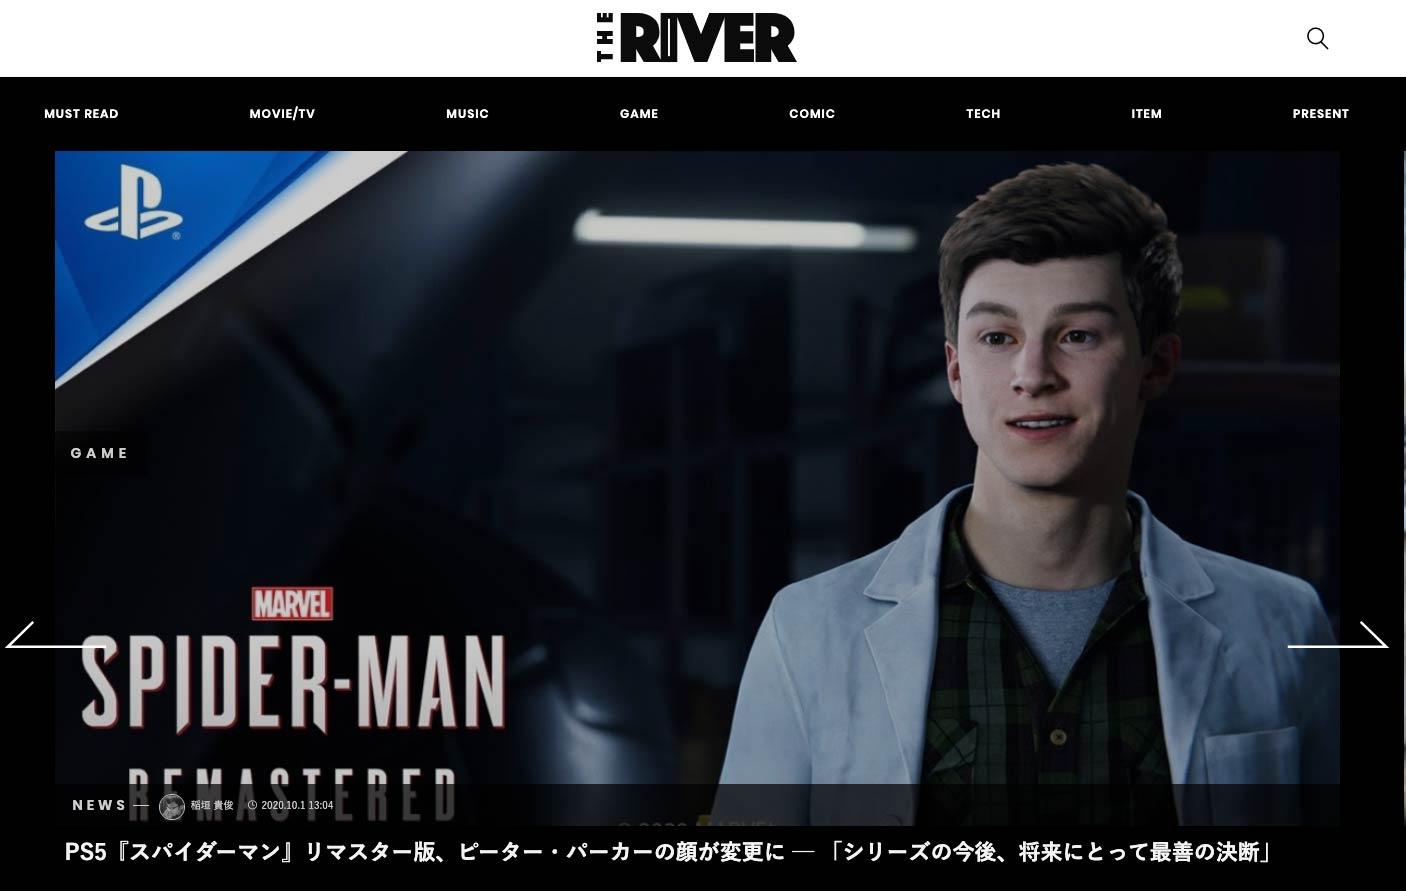 映画 情報 the river